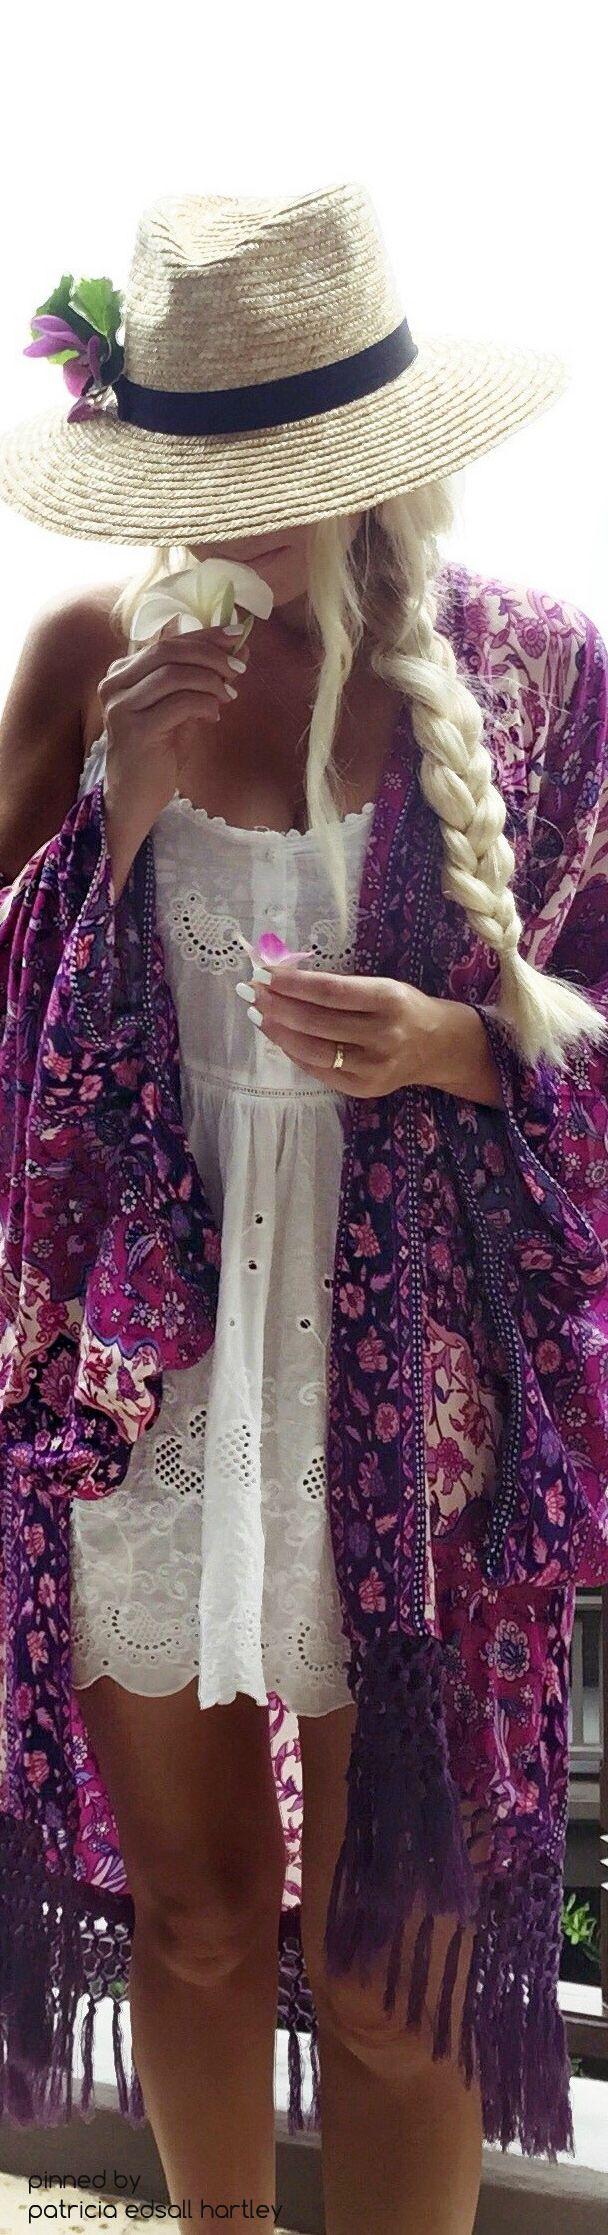 Bien connu Best 25+ Hippie things ideas on Pinterest | Boho style clothing  BU04